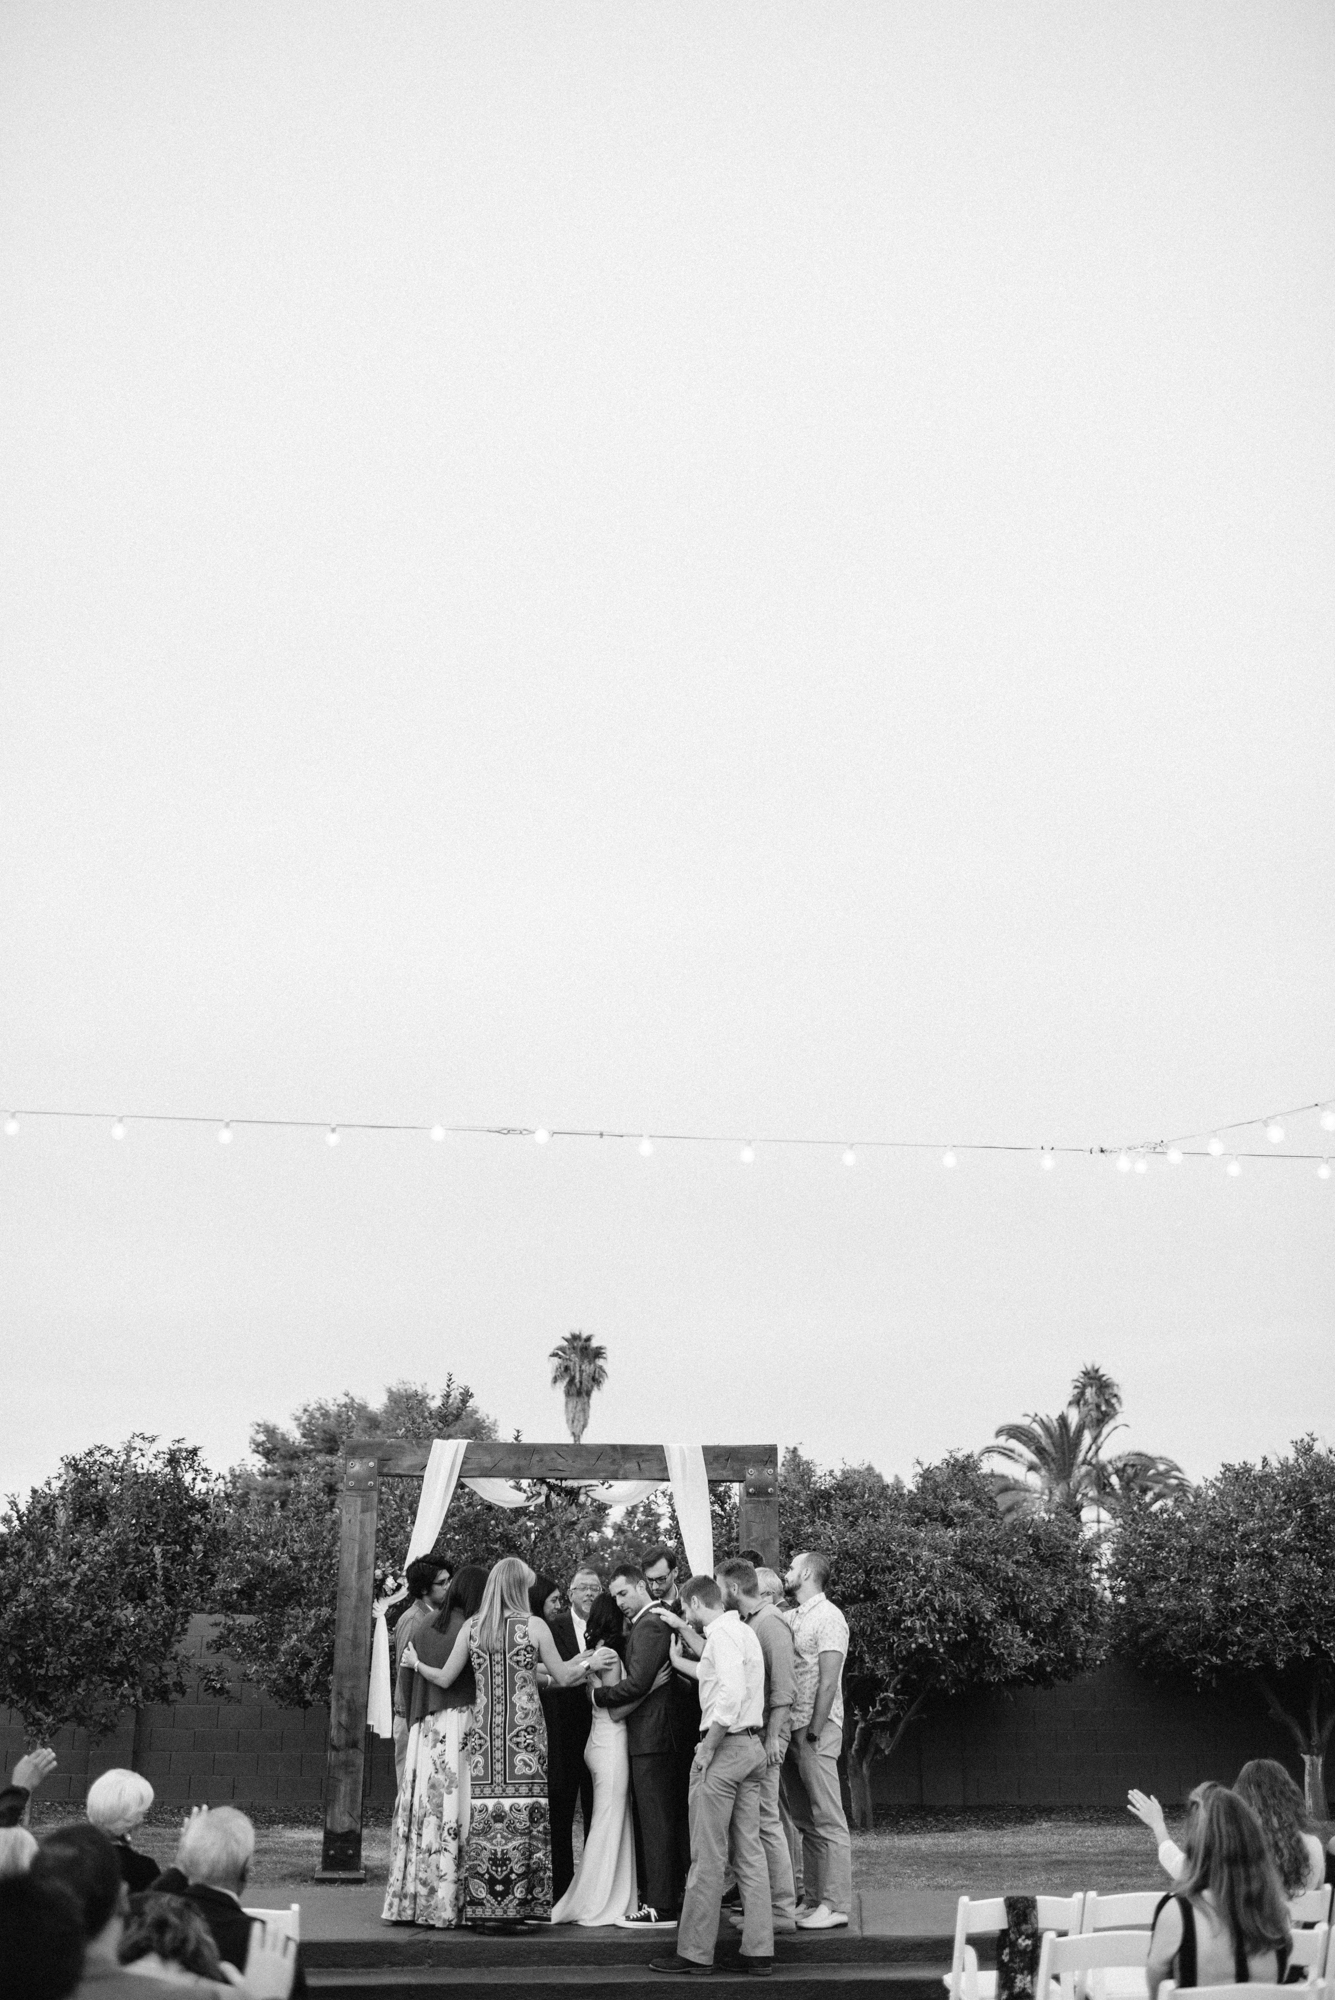 bw-weddingprayer.jpg